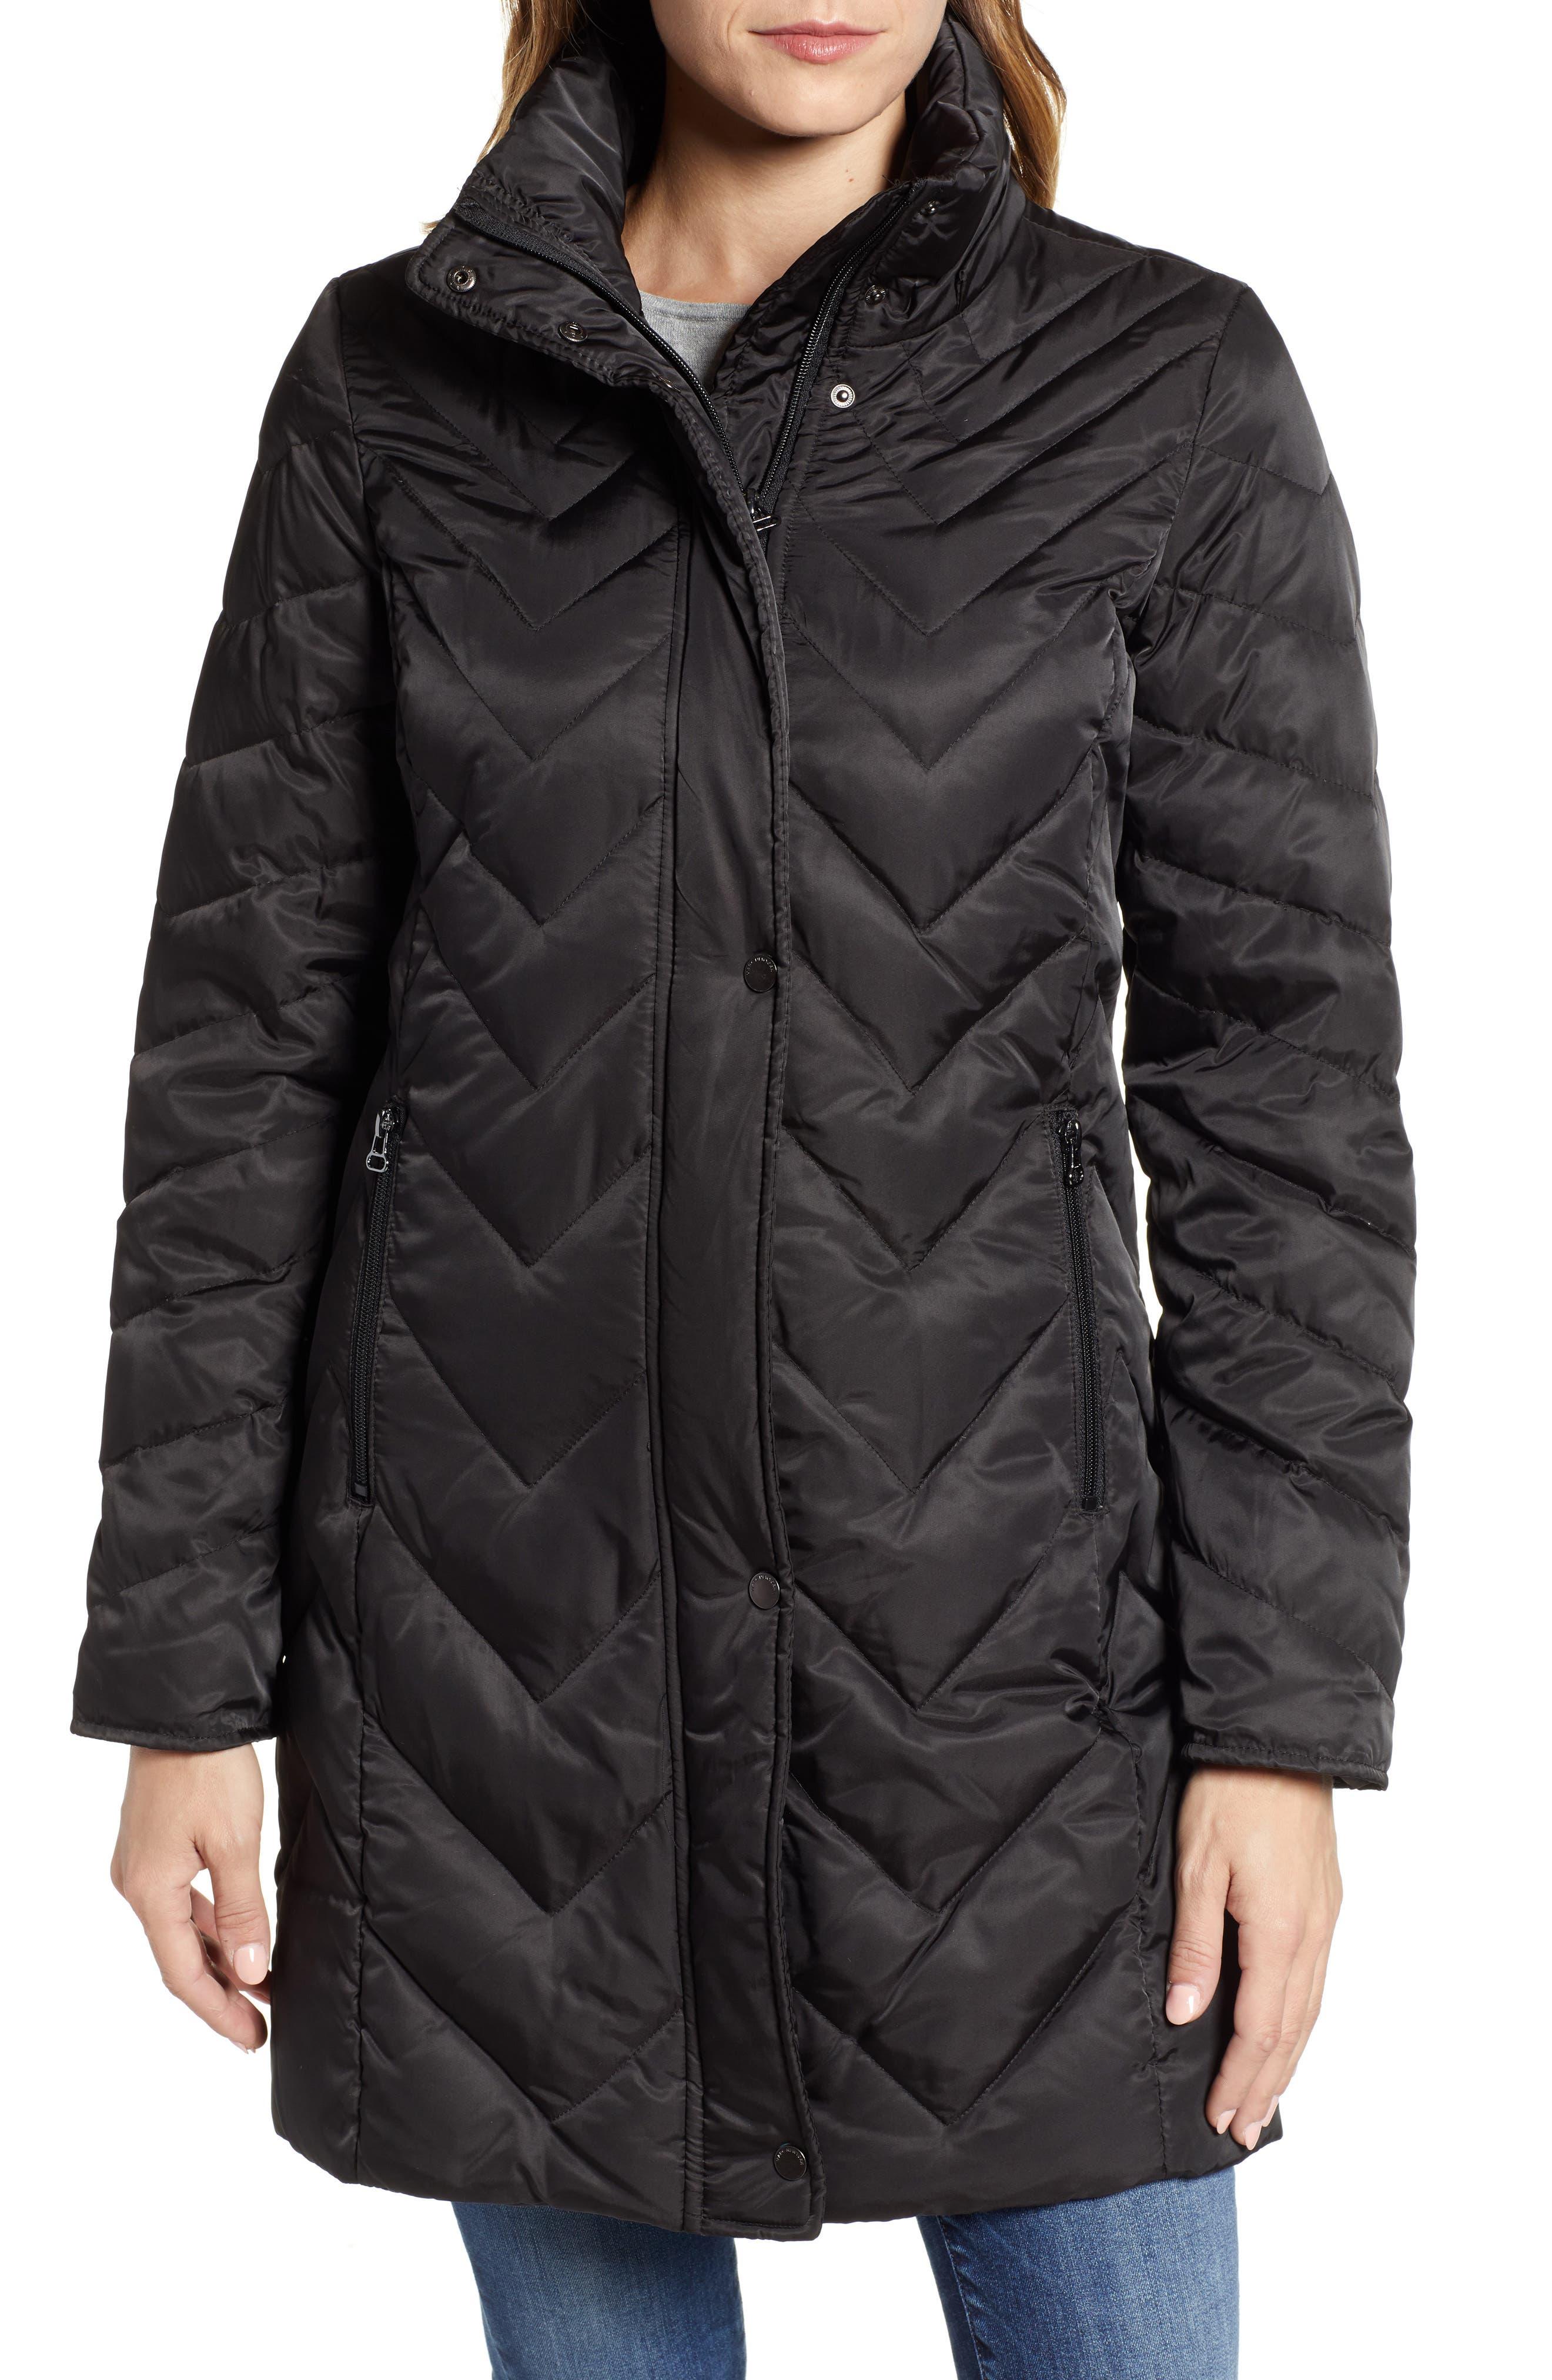 MARC NEW YORK, Matte Satin Chevron Faux Fur Trim Coat, Alternate thumbnail 5, color, BLACK